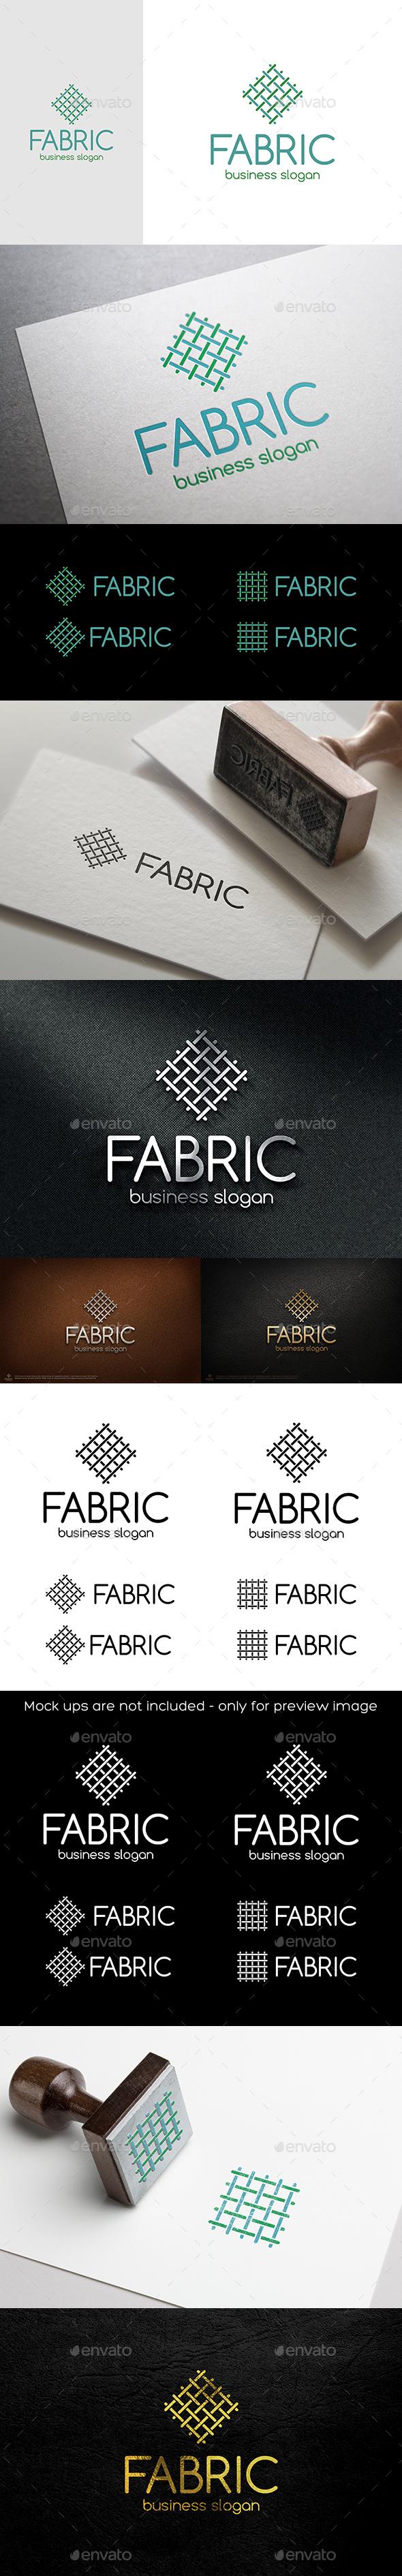 Fabric Canvas Linien Logo - Symbols Logo Templates